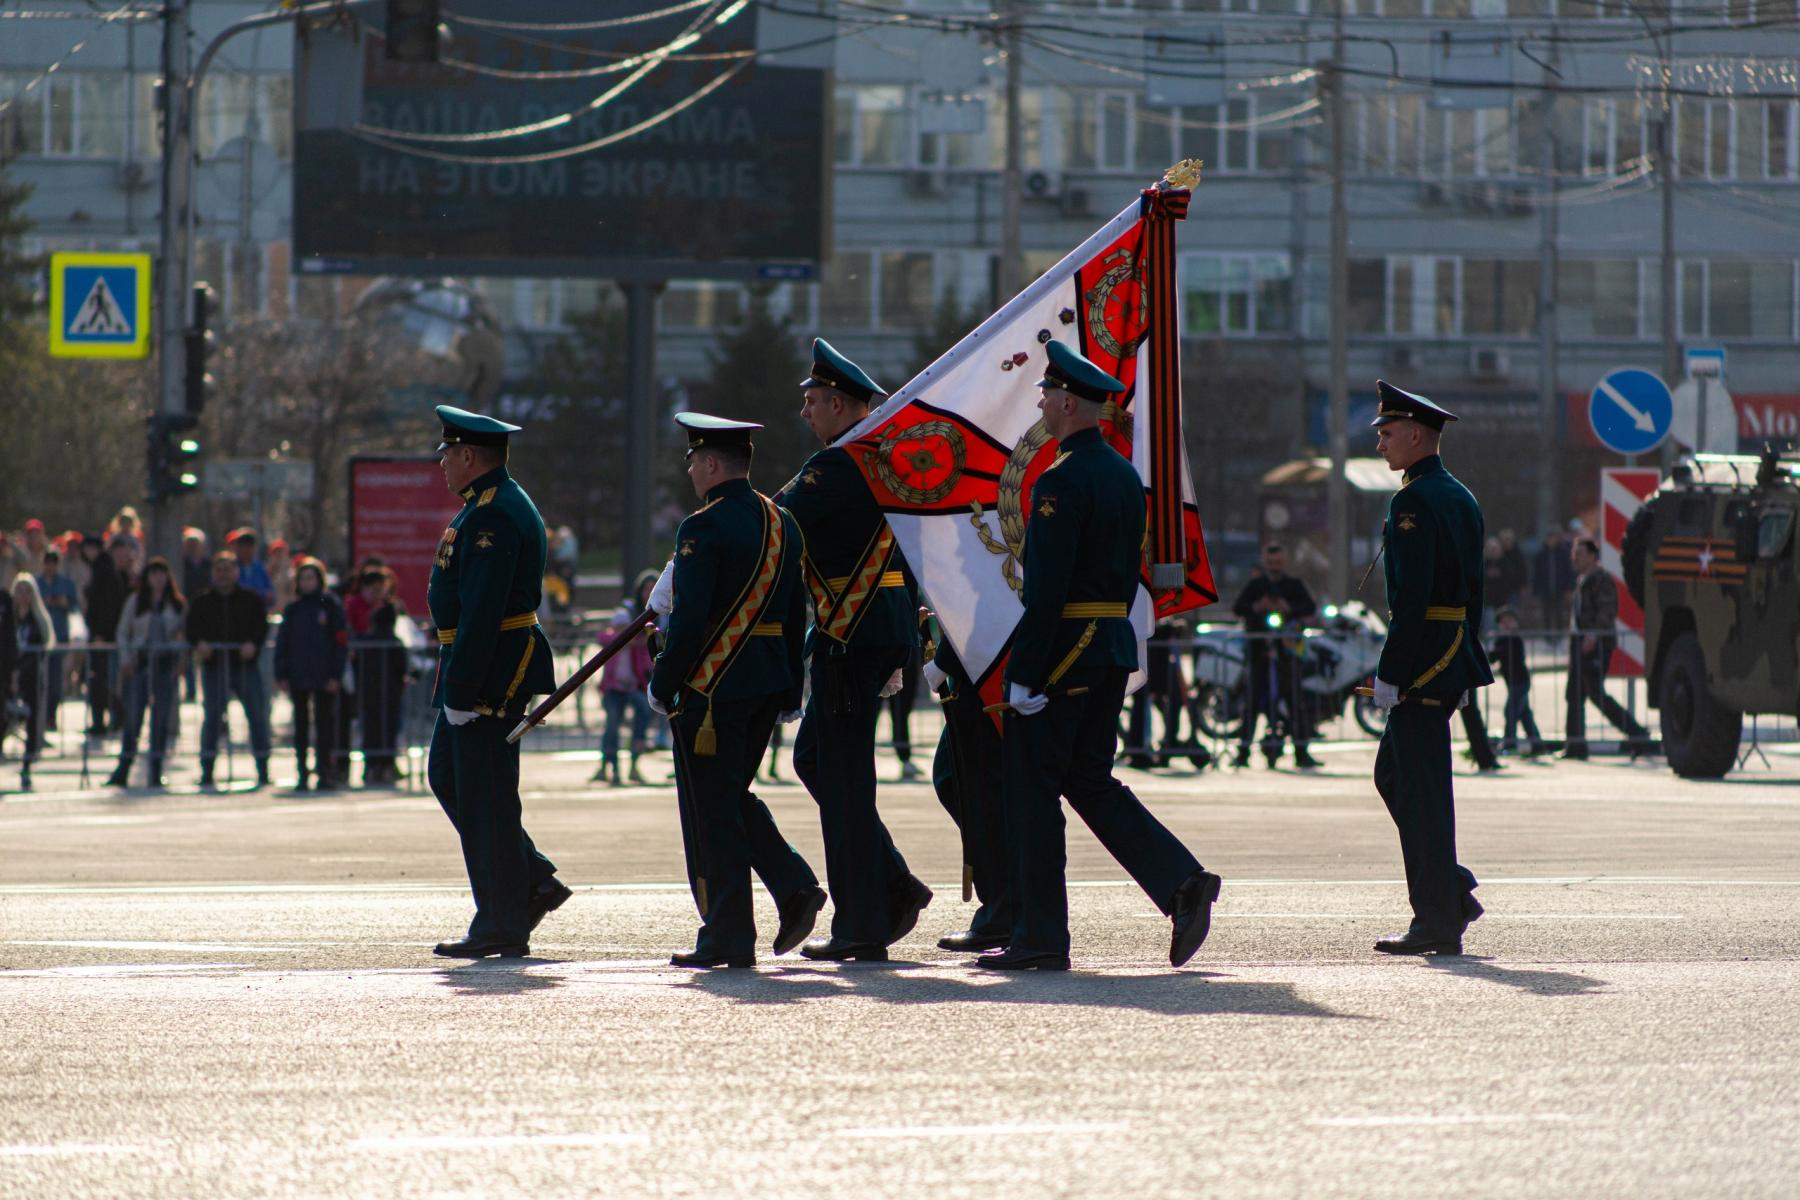 Фото Флаги, форма, техника, толпы зрителей: лучшие фото с репетиции парада в Новосибирске 3